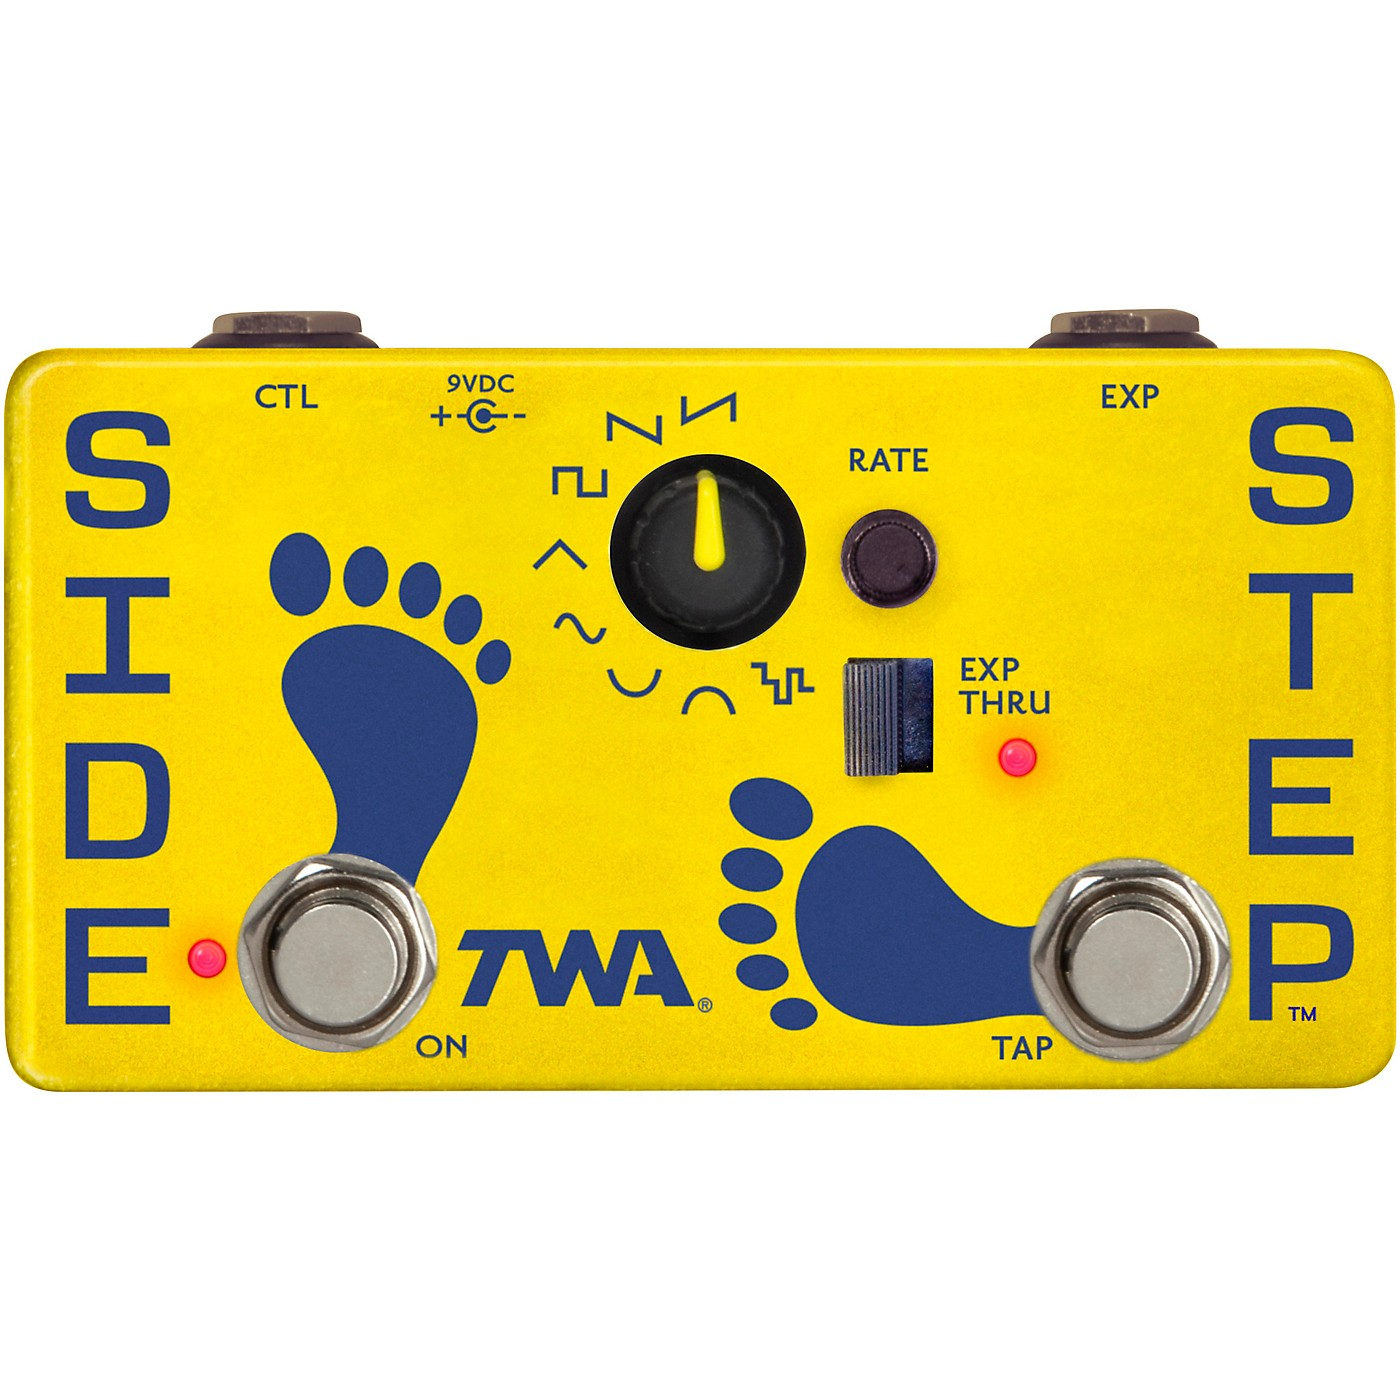 TWA SIDE STEP- universal variable state lfo thumbnail